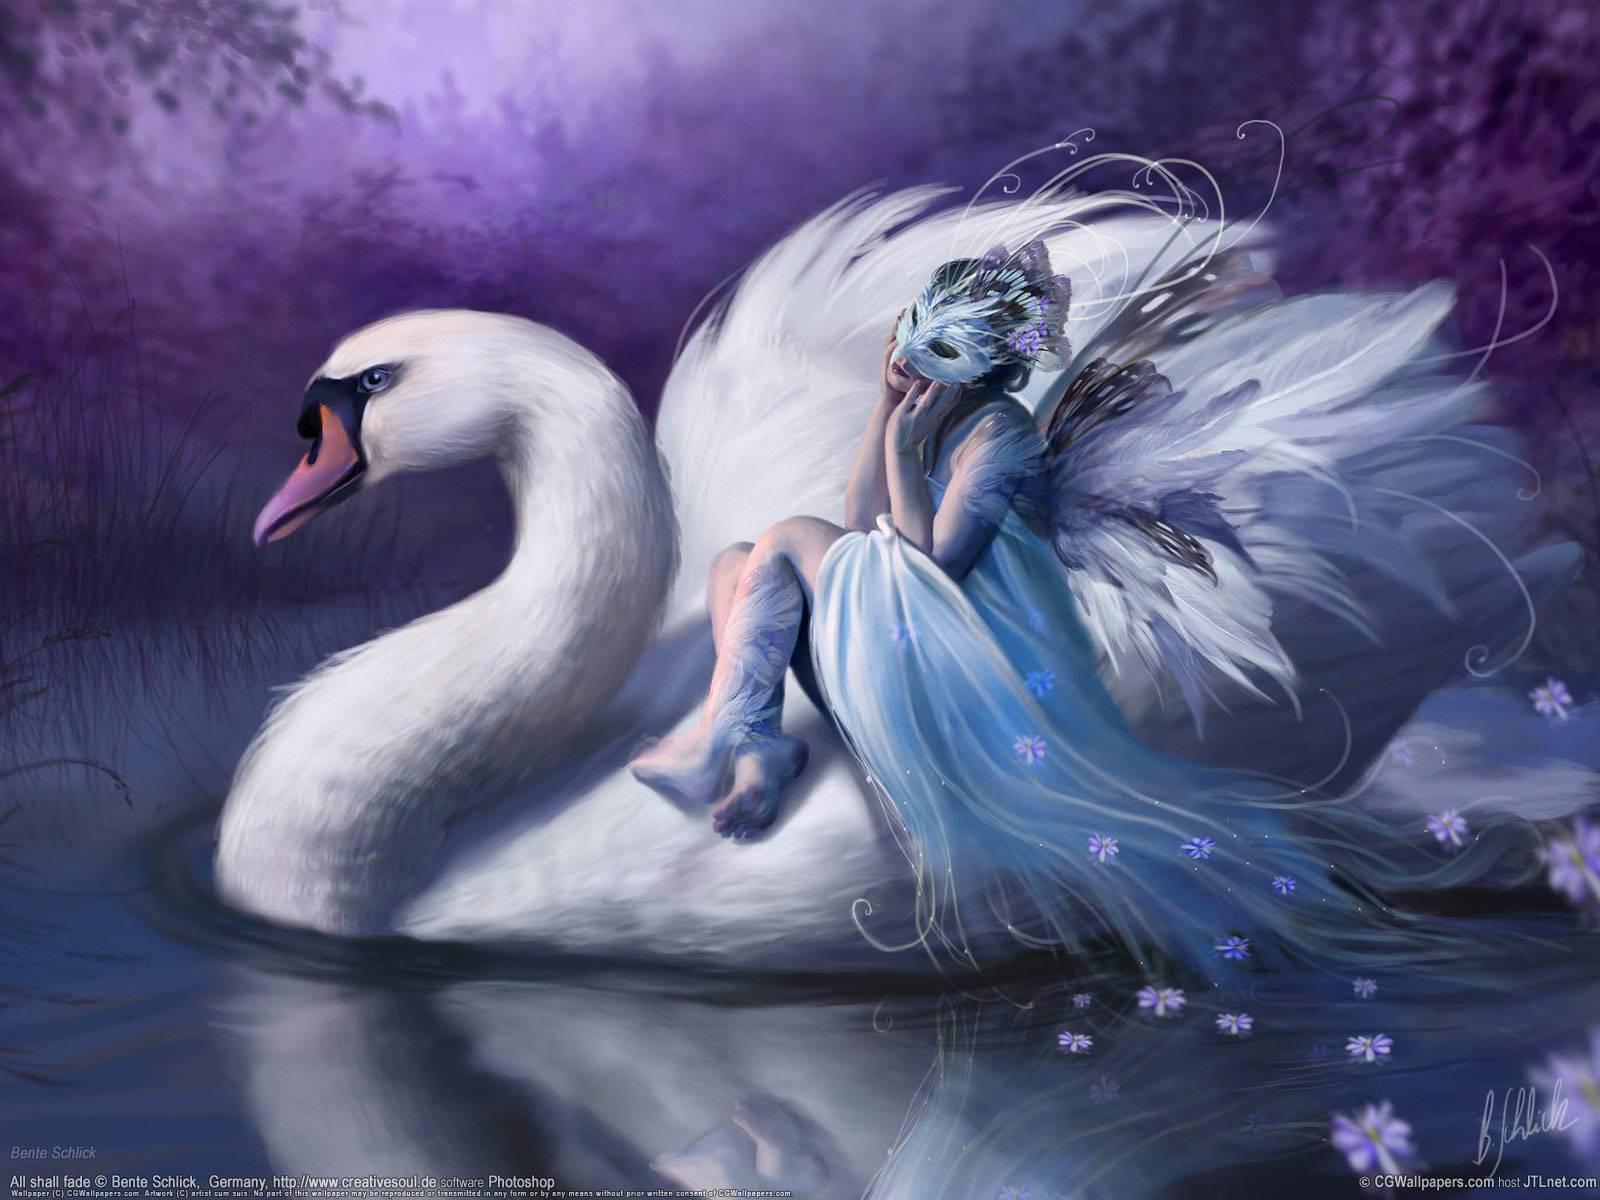 Beautiful fairies wallpapers wallpaper cave beautiful fairy in purple with a swan fairy wallpaper altavistaventures Image collections